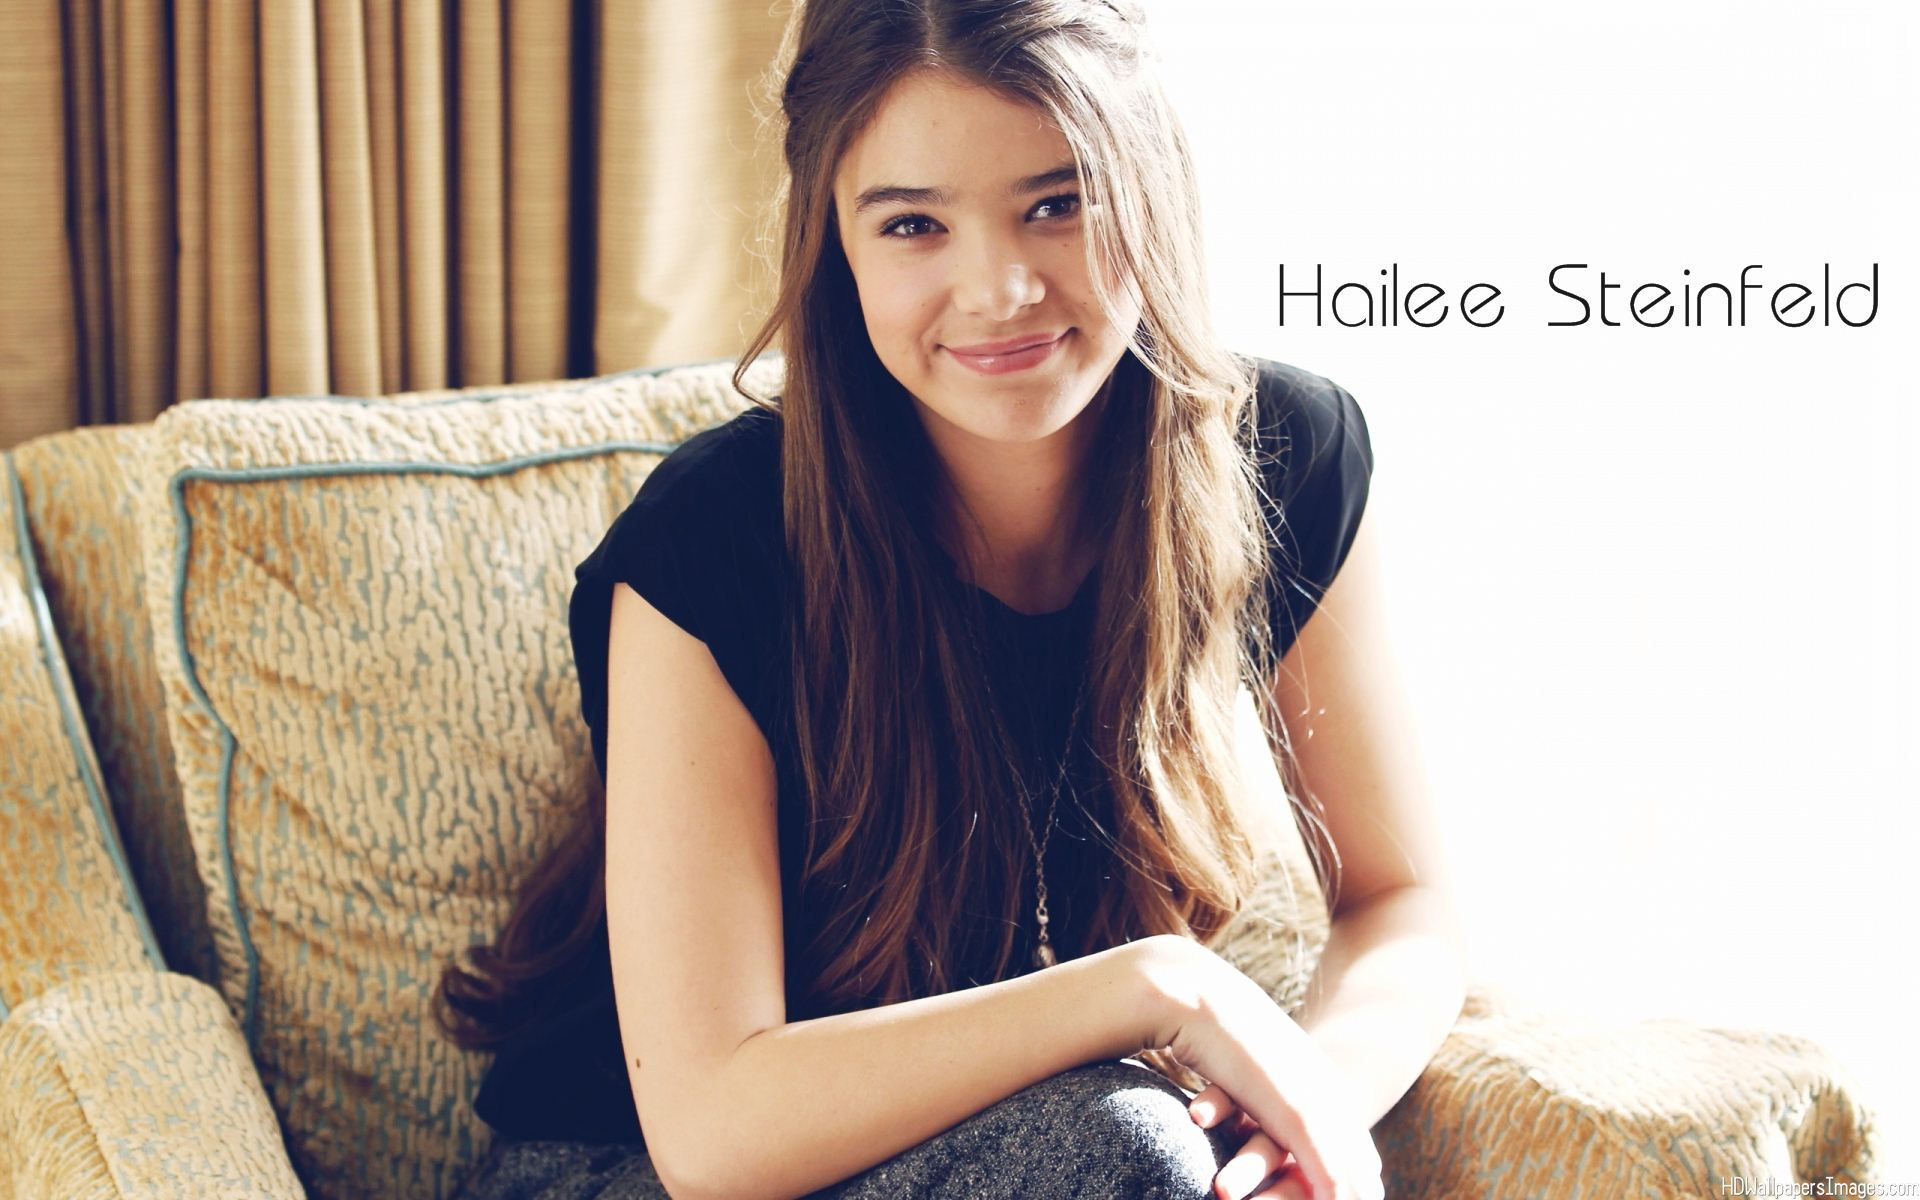 Hailee-Steinfeld-Images